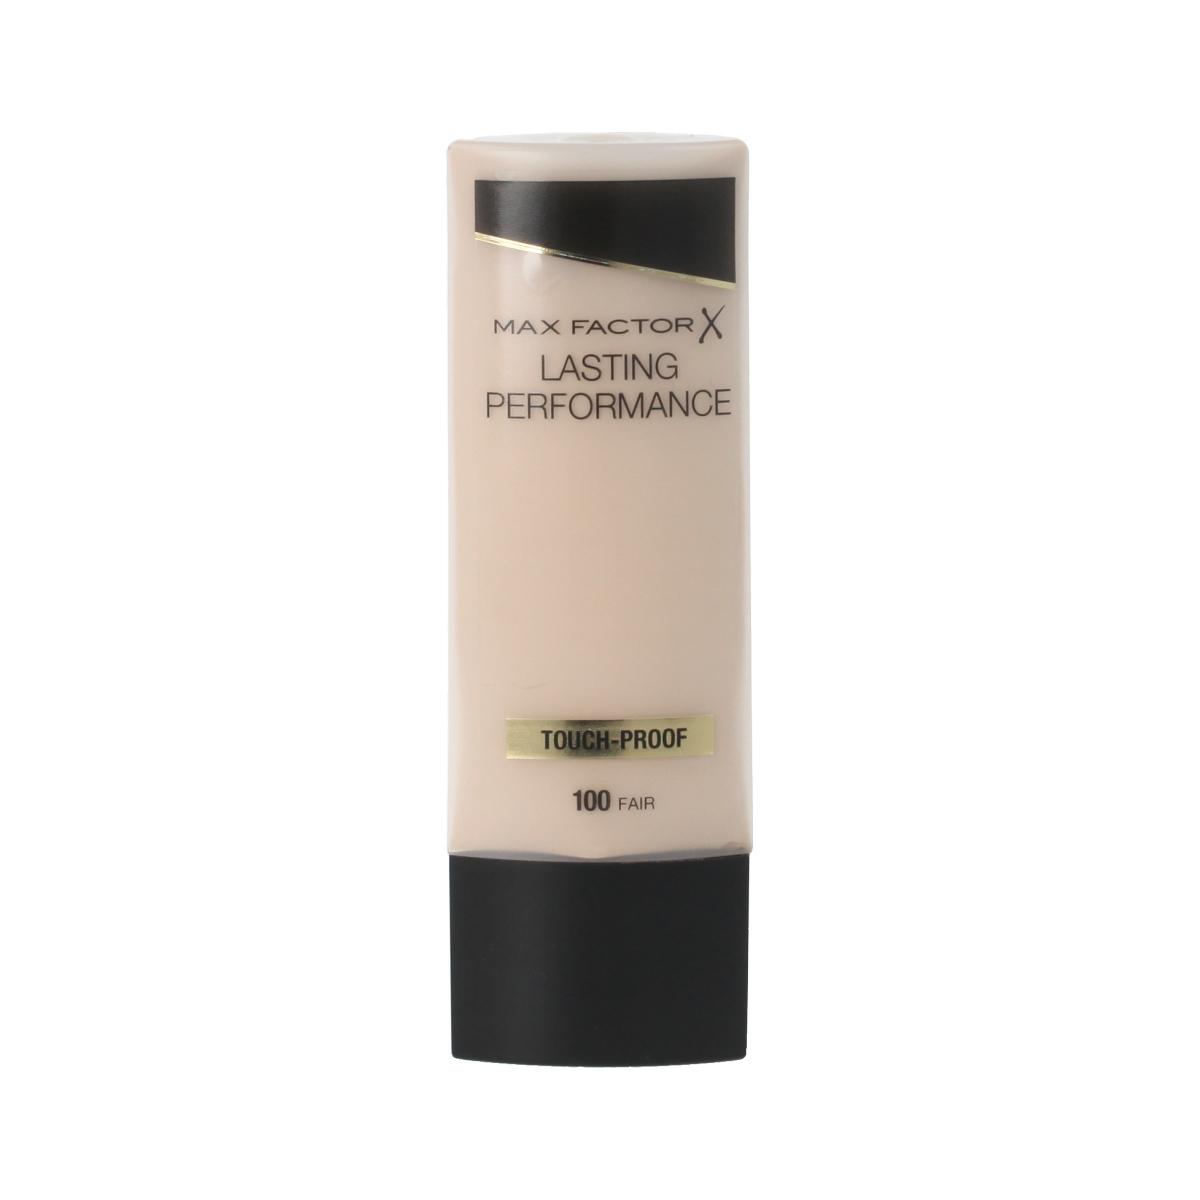 Max Factor Lasting Performance Long Lasting Make-Up (100 Fair) 35 ml 99531